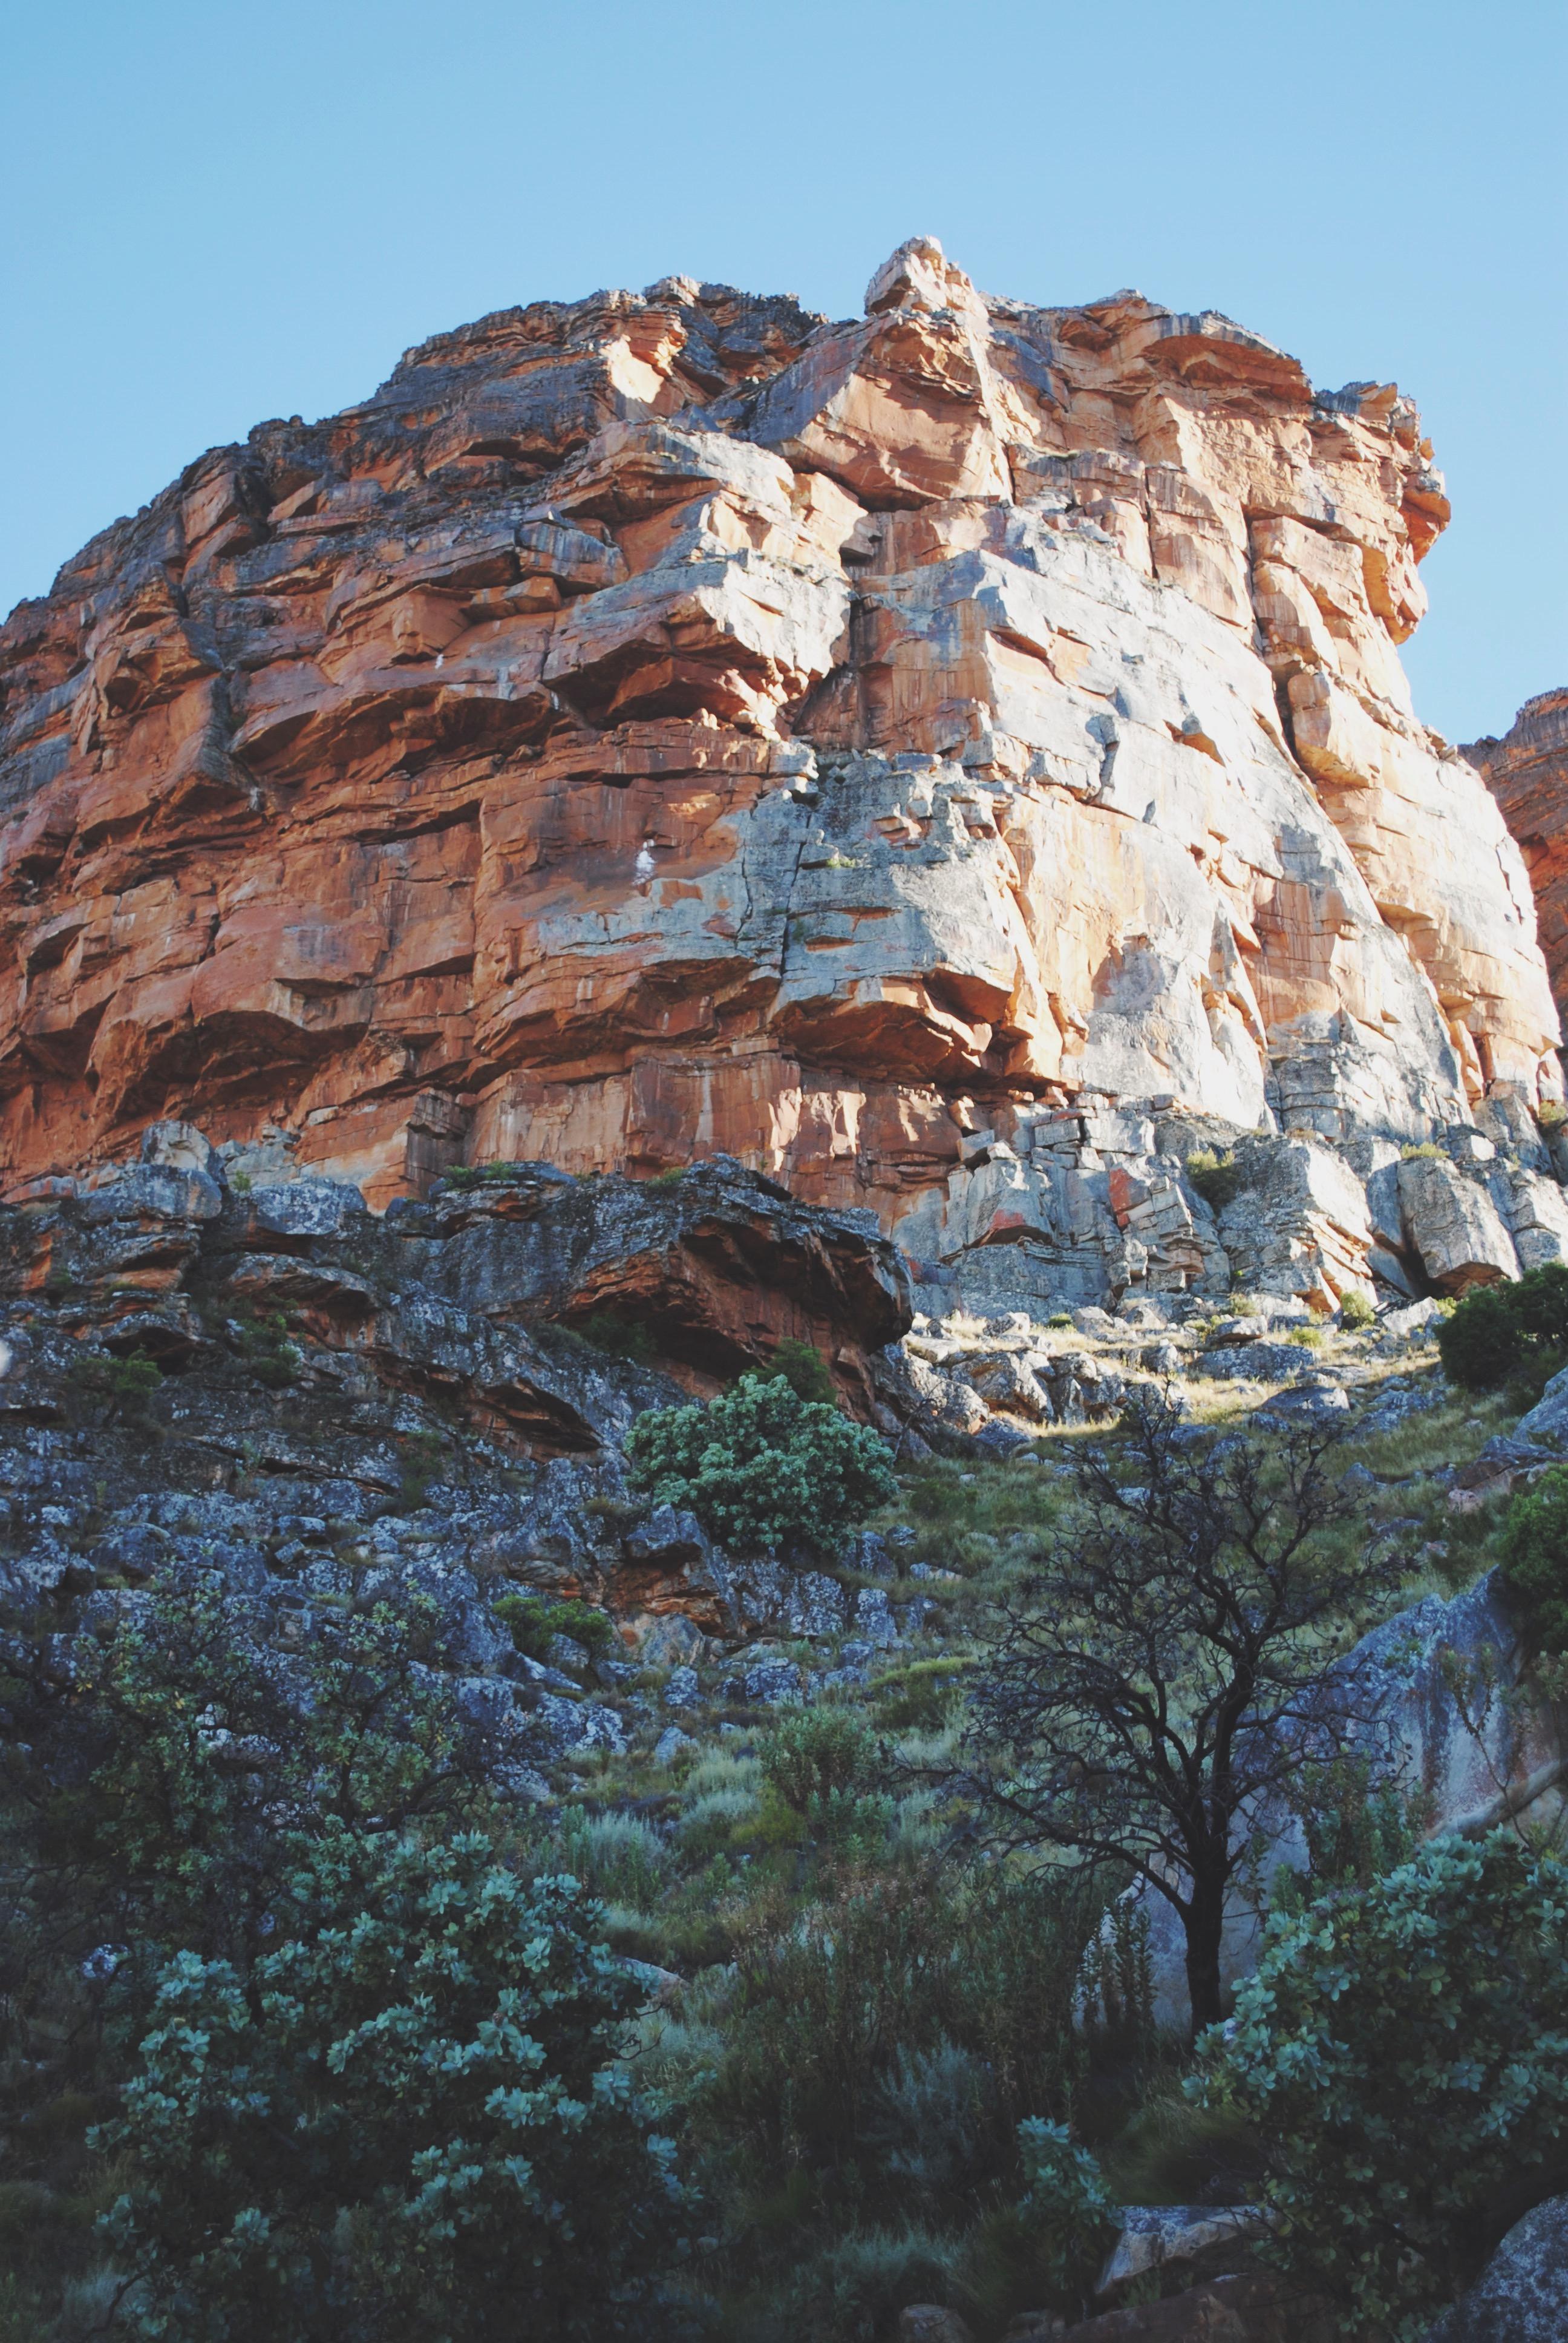 Travel Diary Sederbergen Zuid-Afrika 9